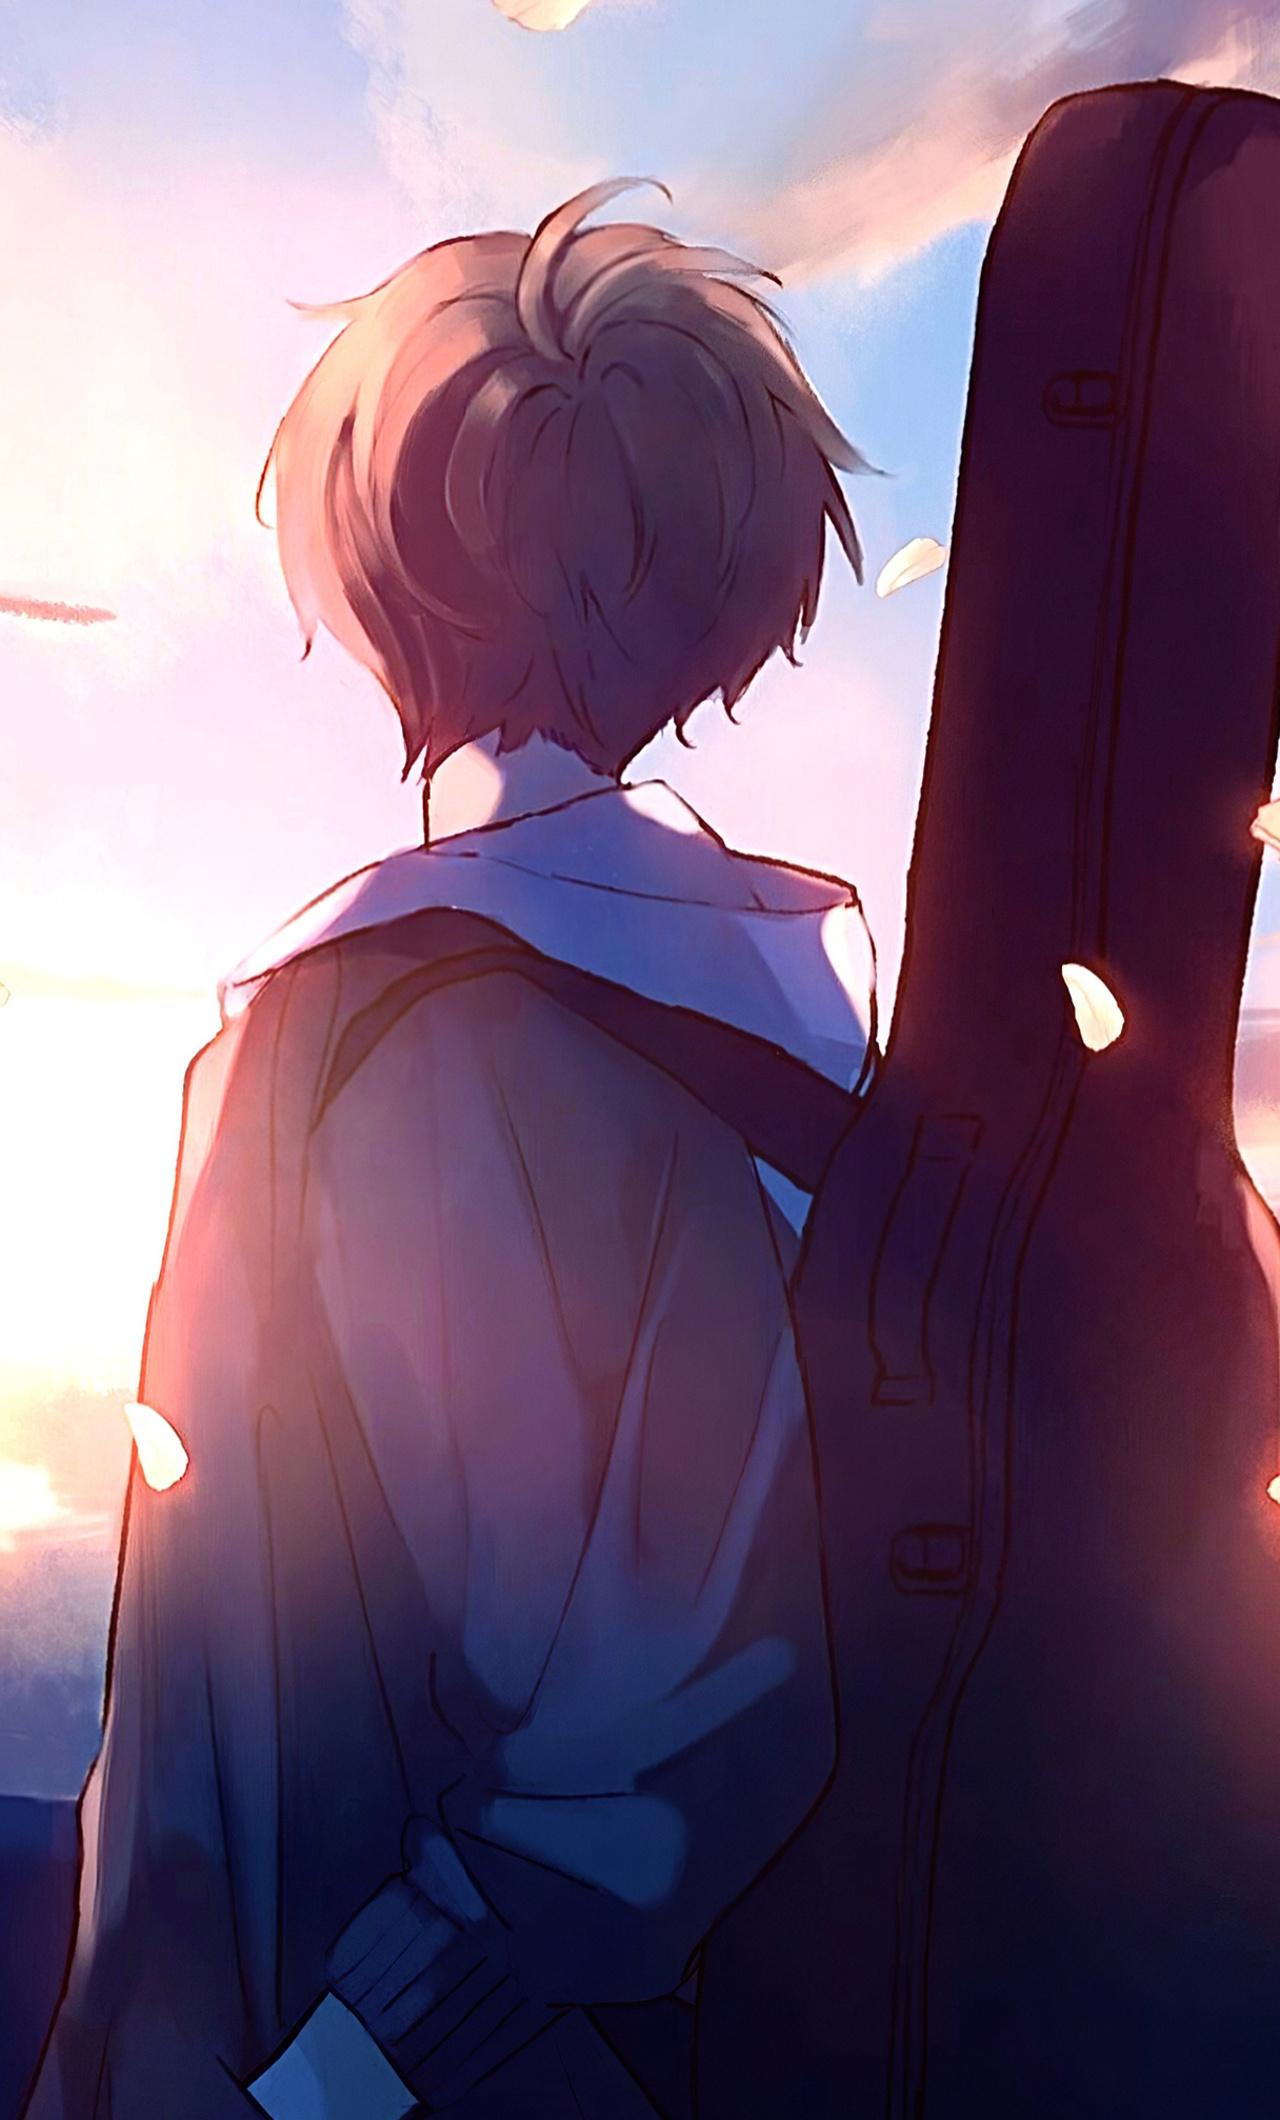 anime boy guitar painting j9